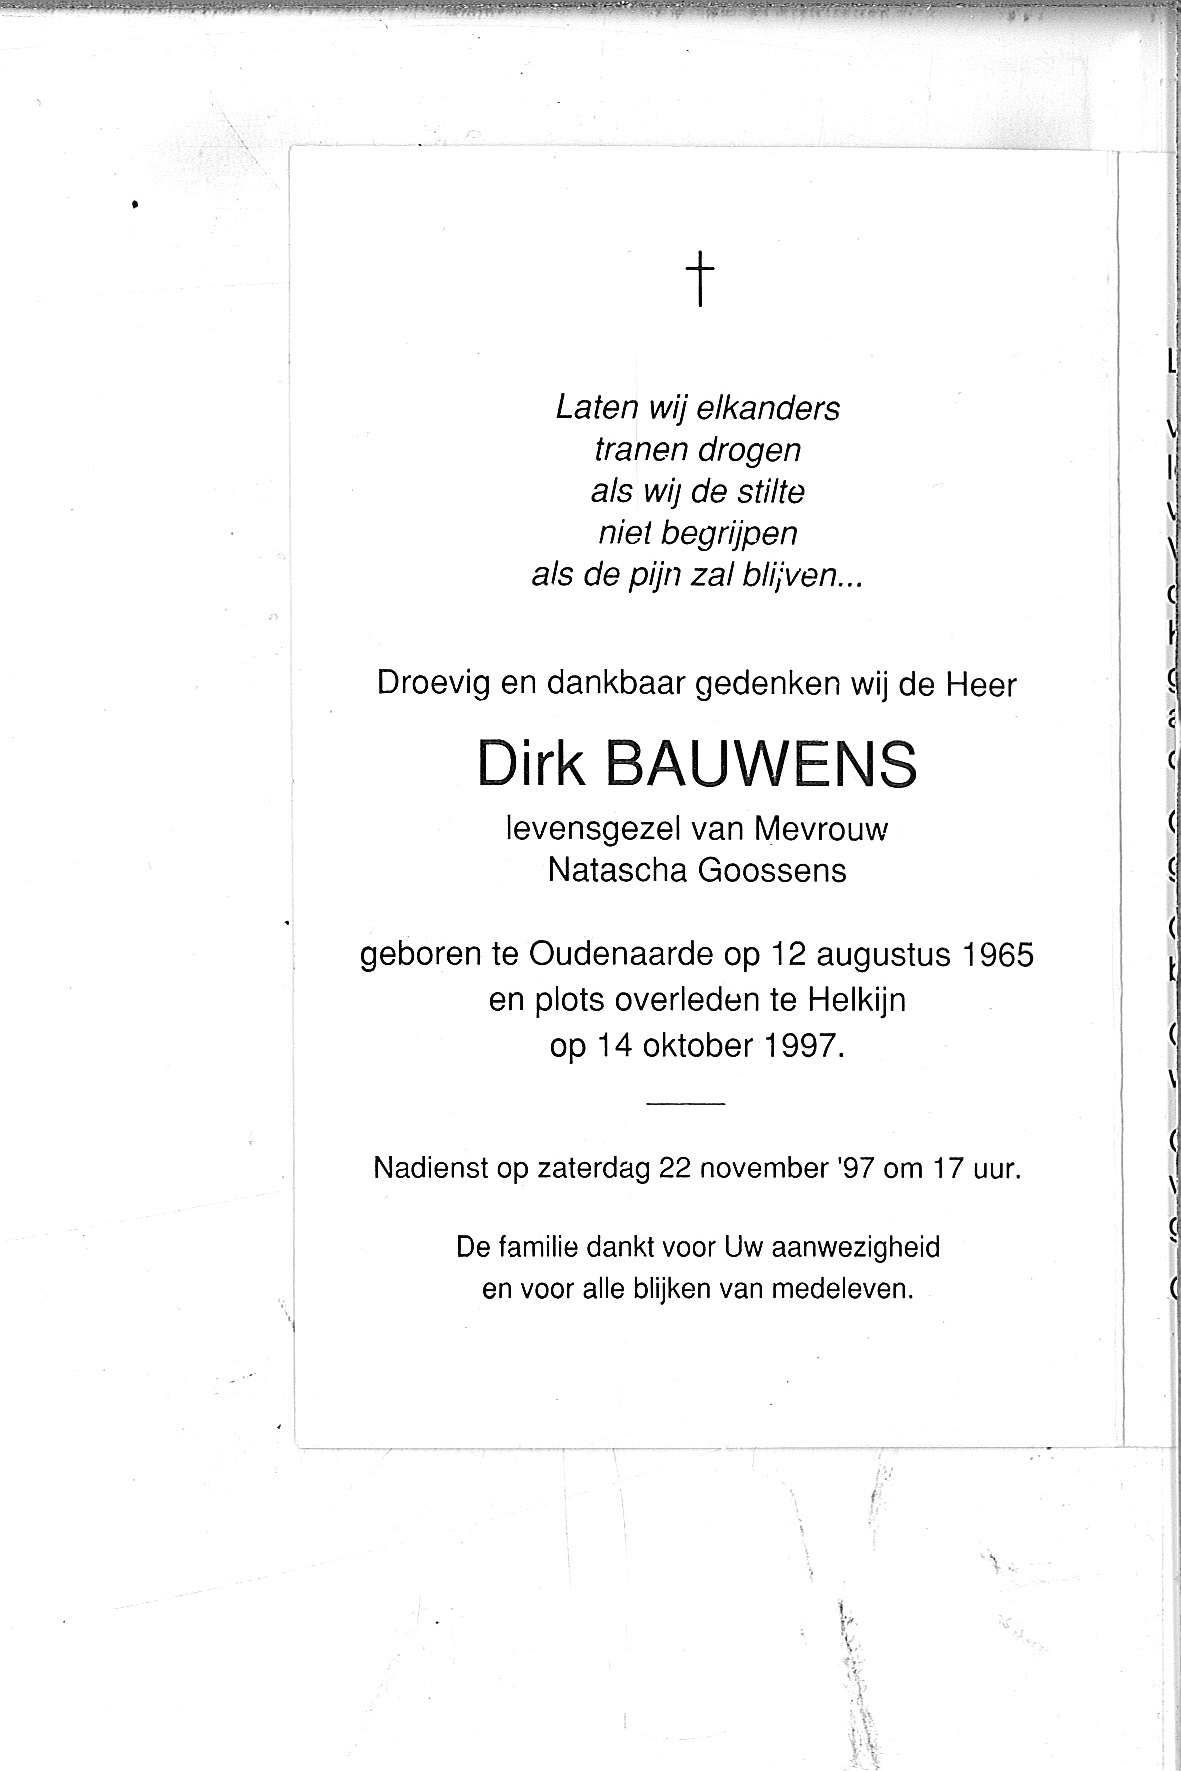 Dirk(1997)20130828133432_00019.jpg